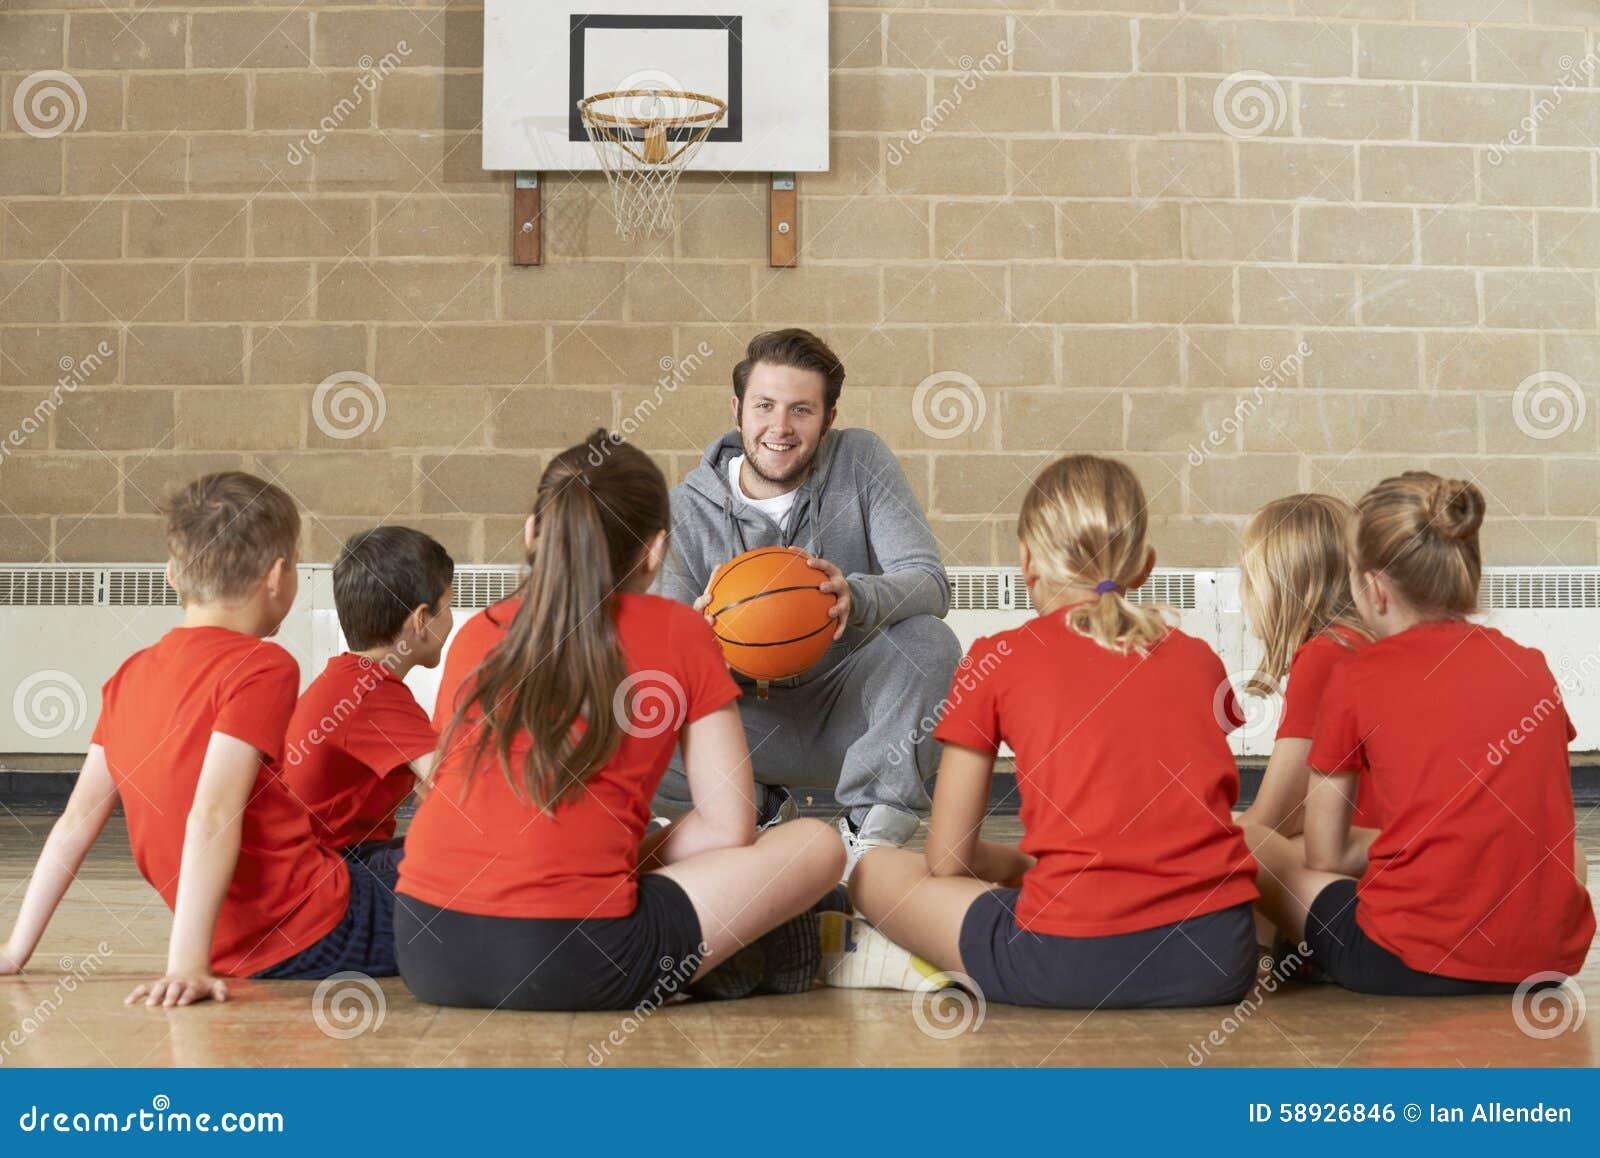 Basketball-Team Trainer-Giving Team Talk To Elementary School